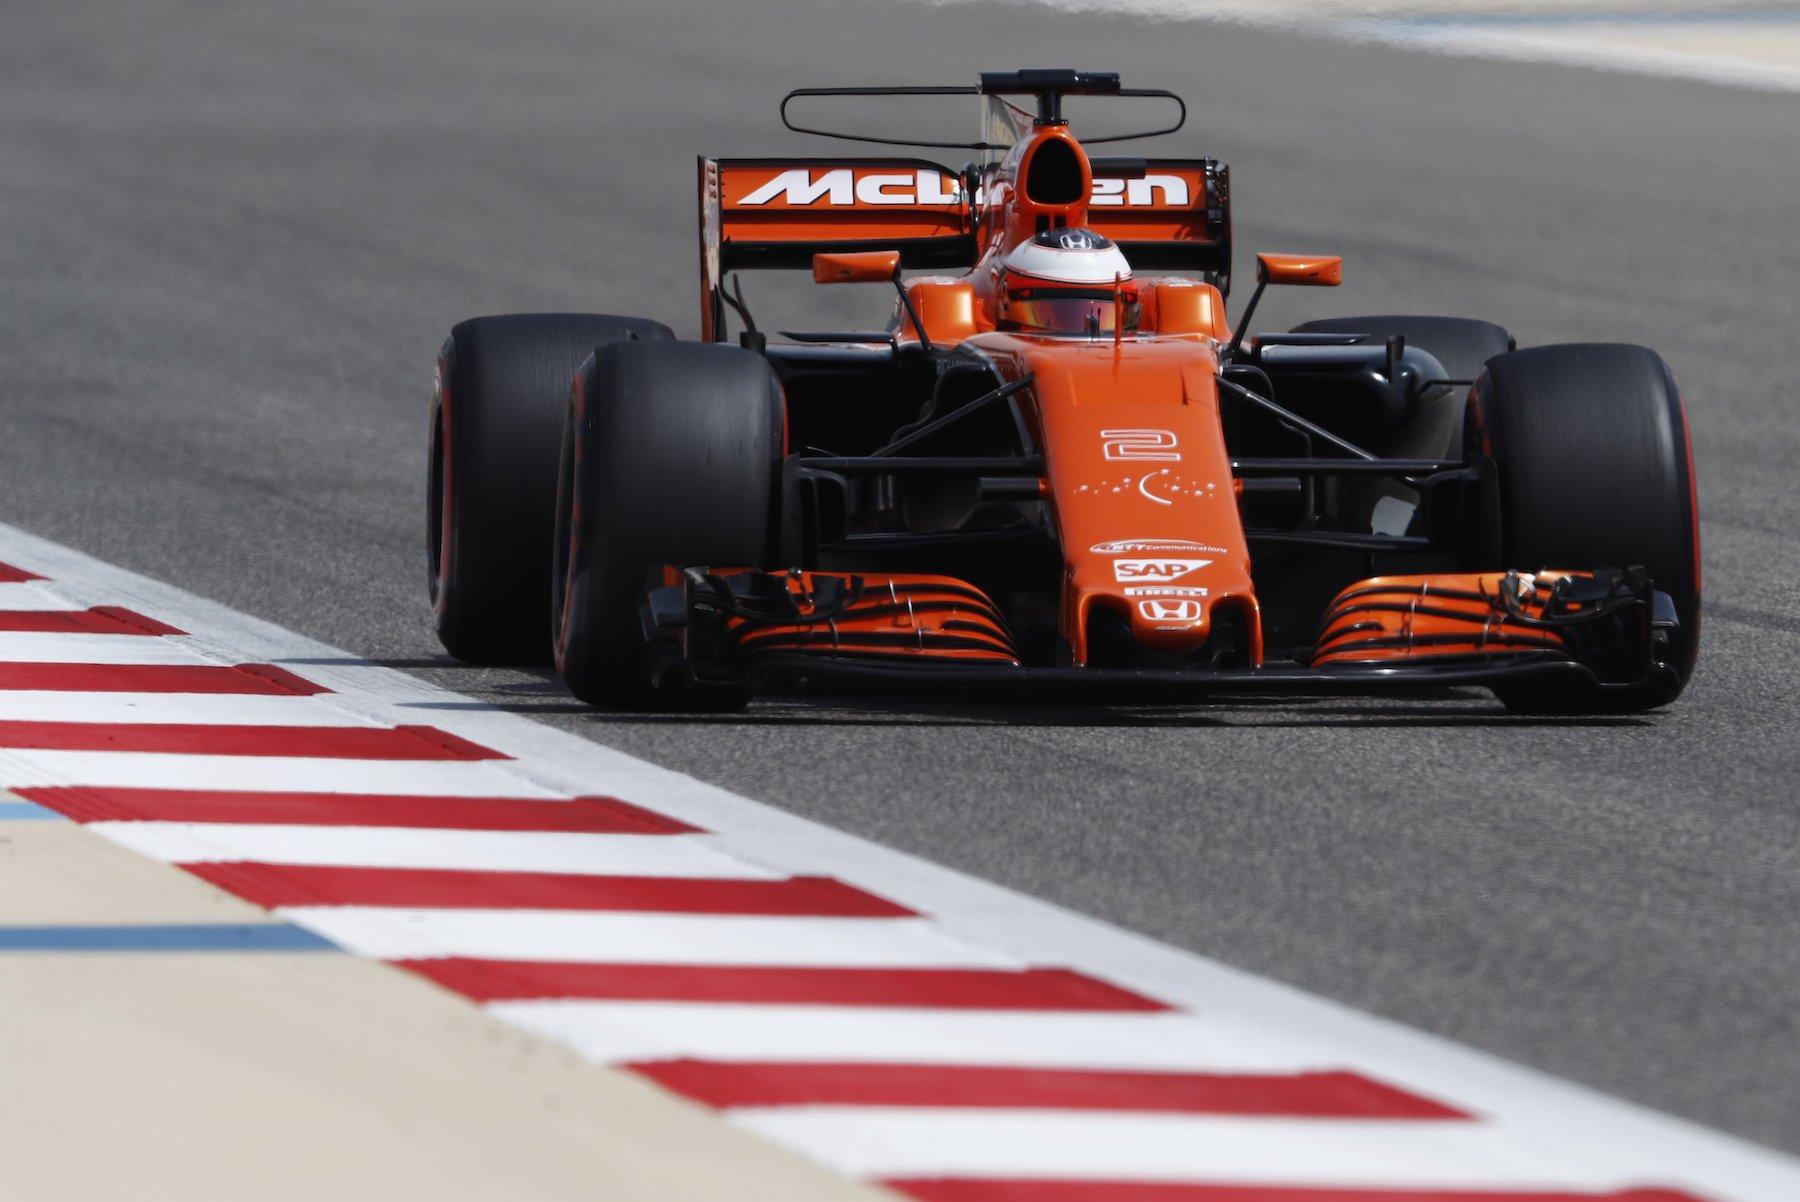 2017 Stoffel Vandoorne | McLaren MCL32 | 2017 Bahrain test 1 copy.jpg